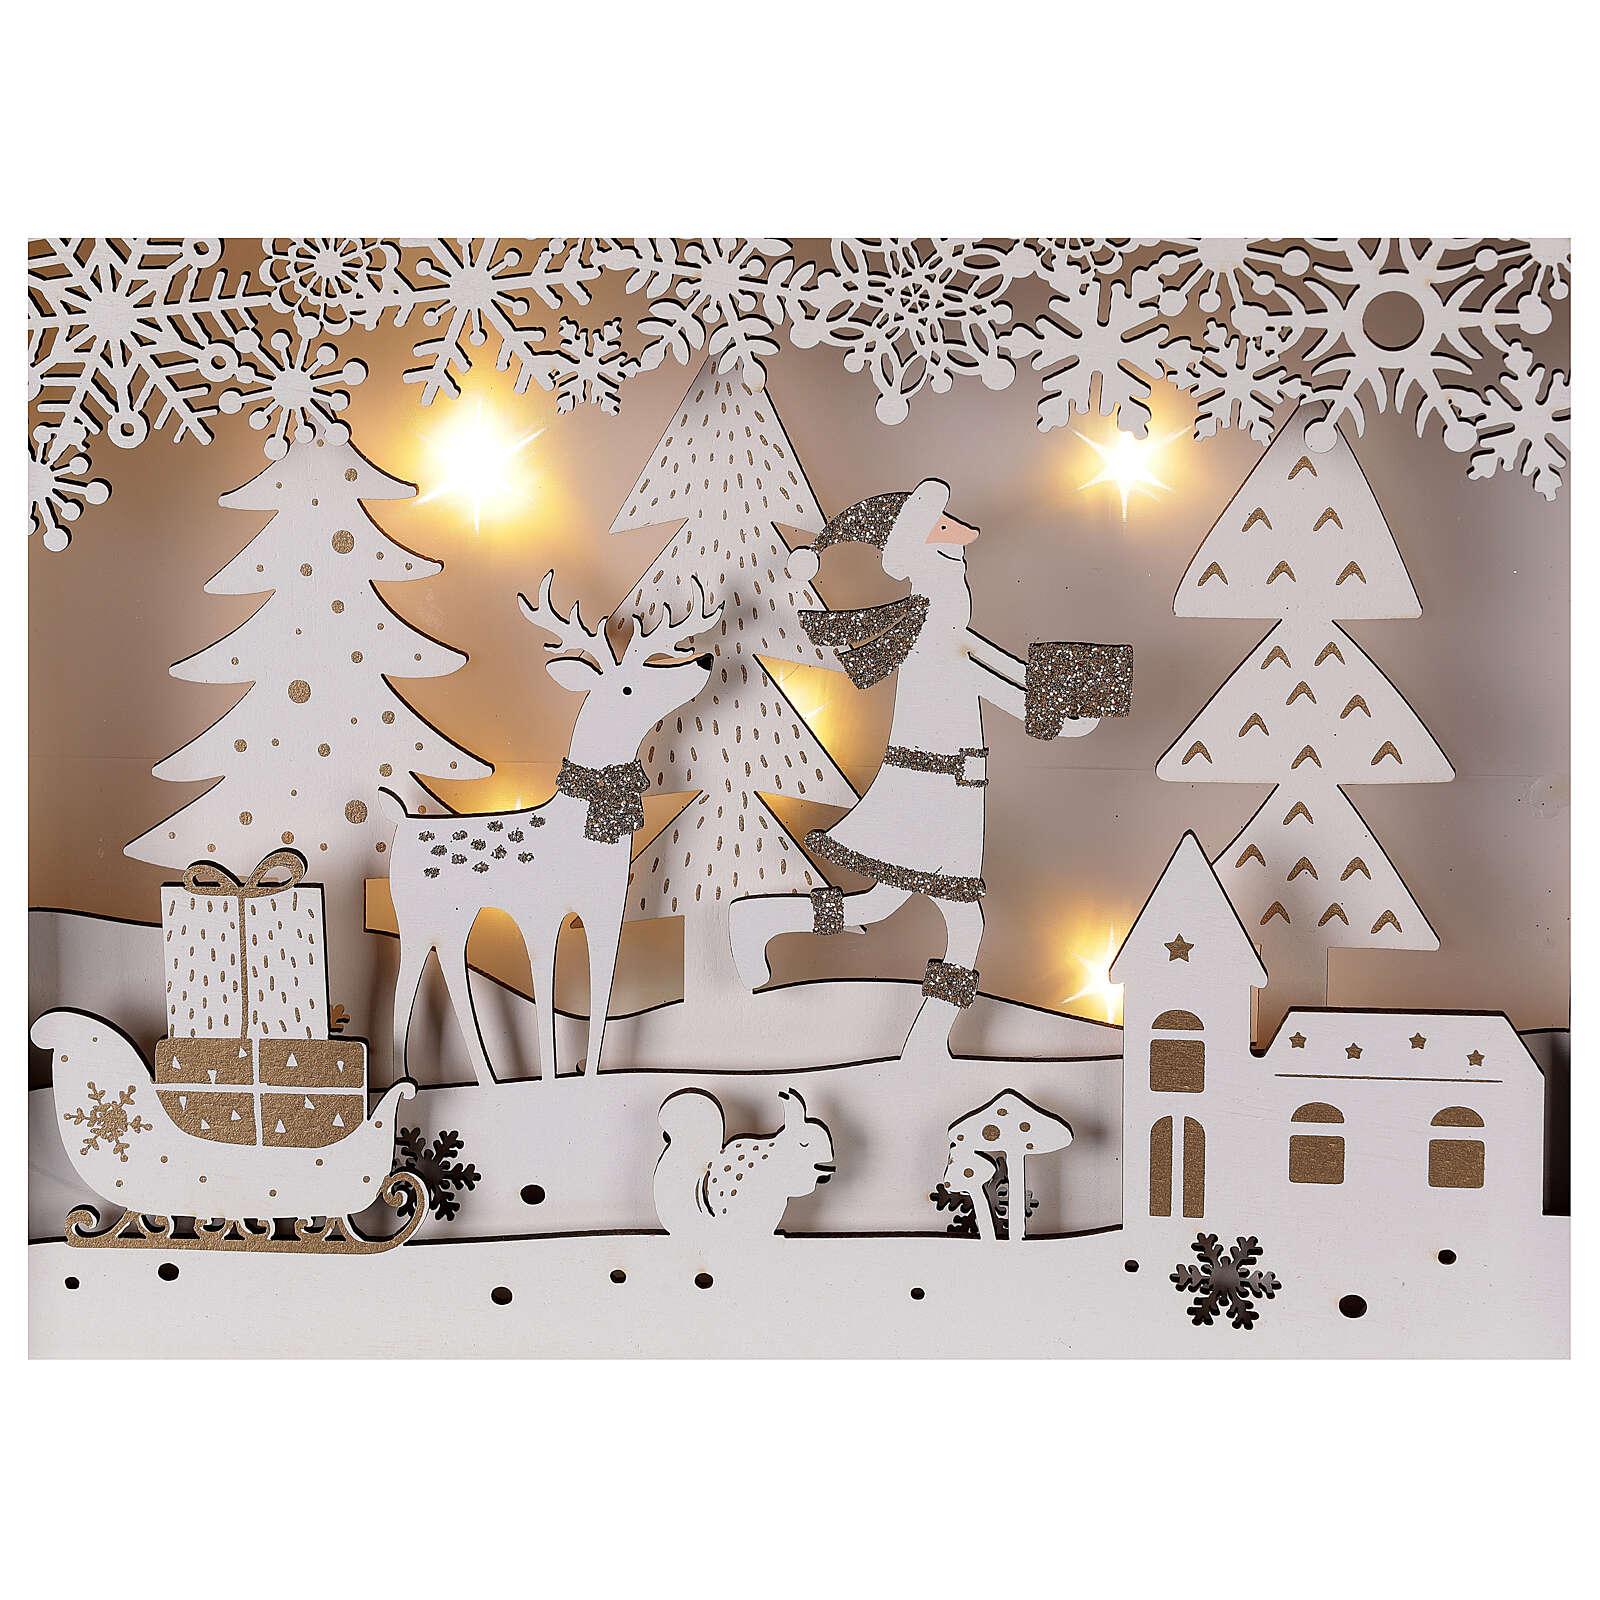 Wooden Advent calendar white lights 27 cm 3